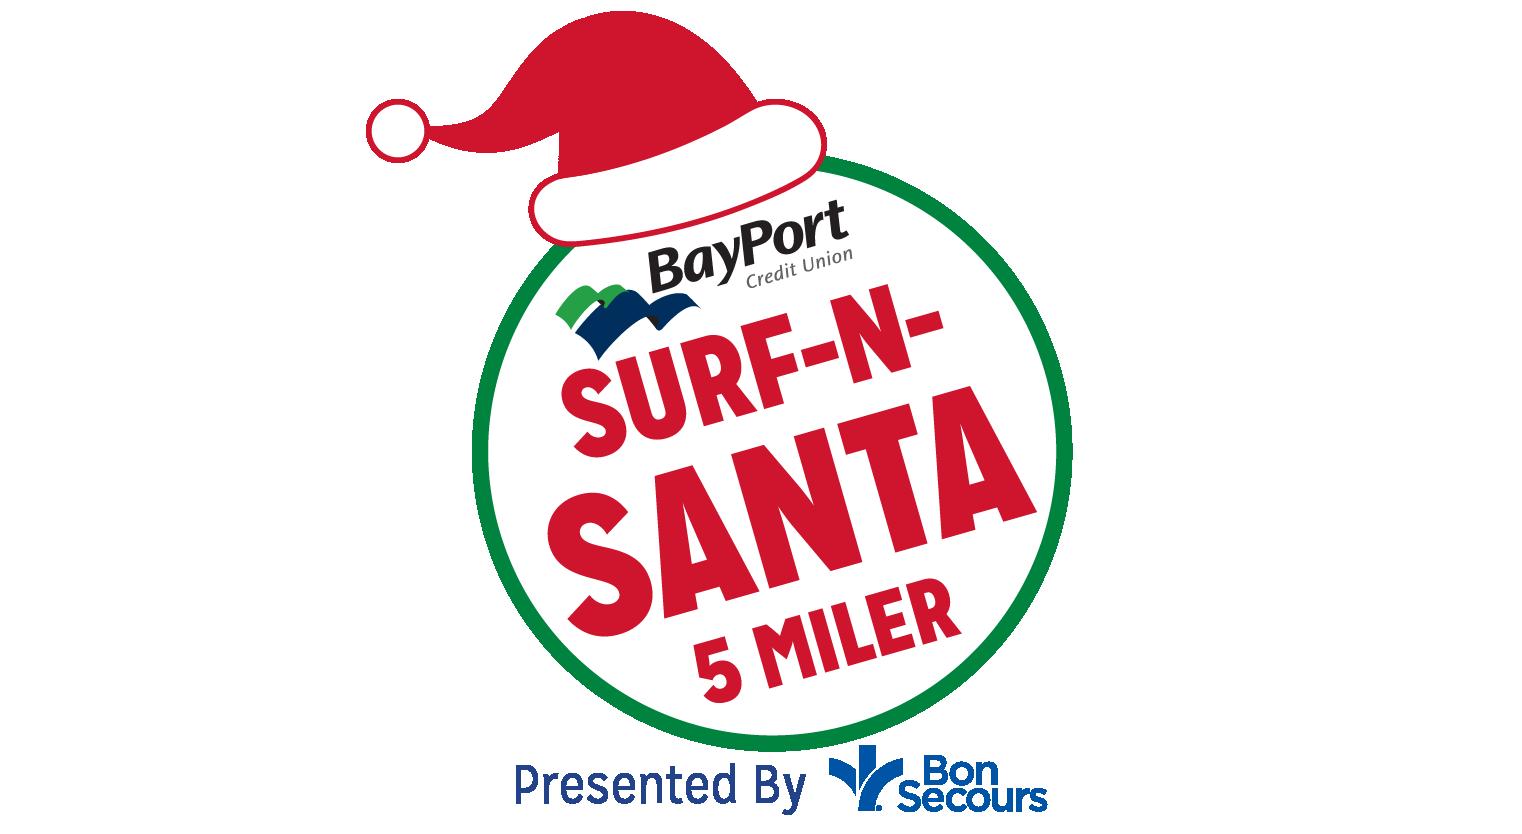 Surf-n-Santa 5 Miler